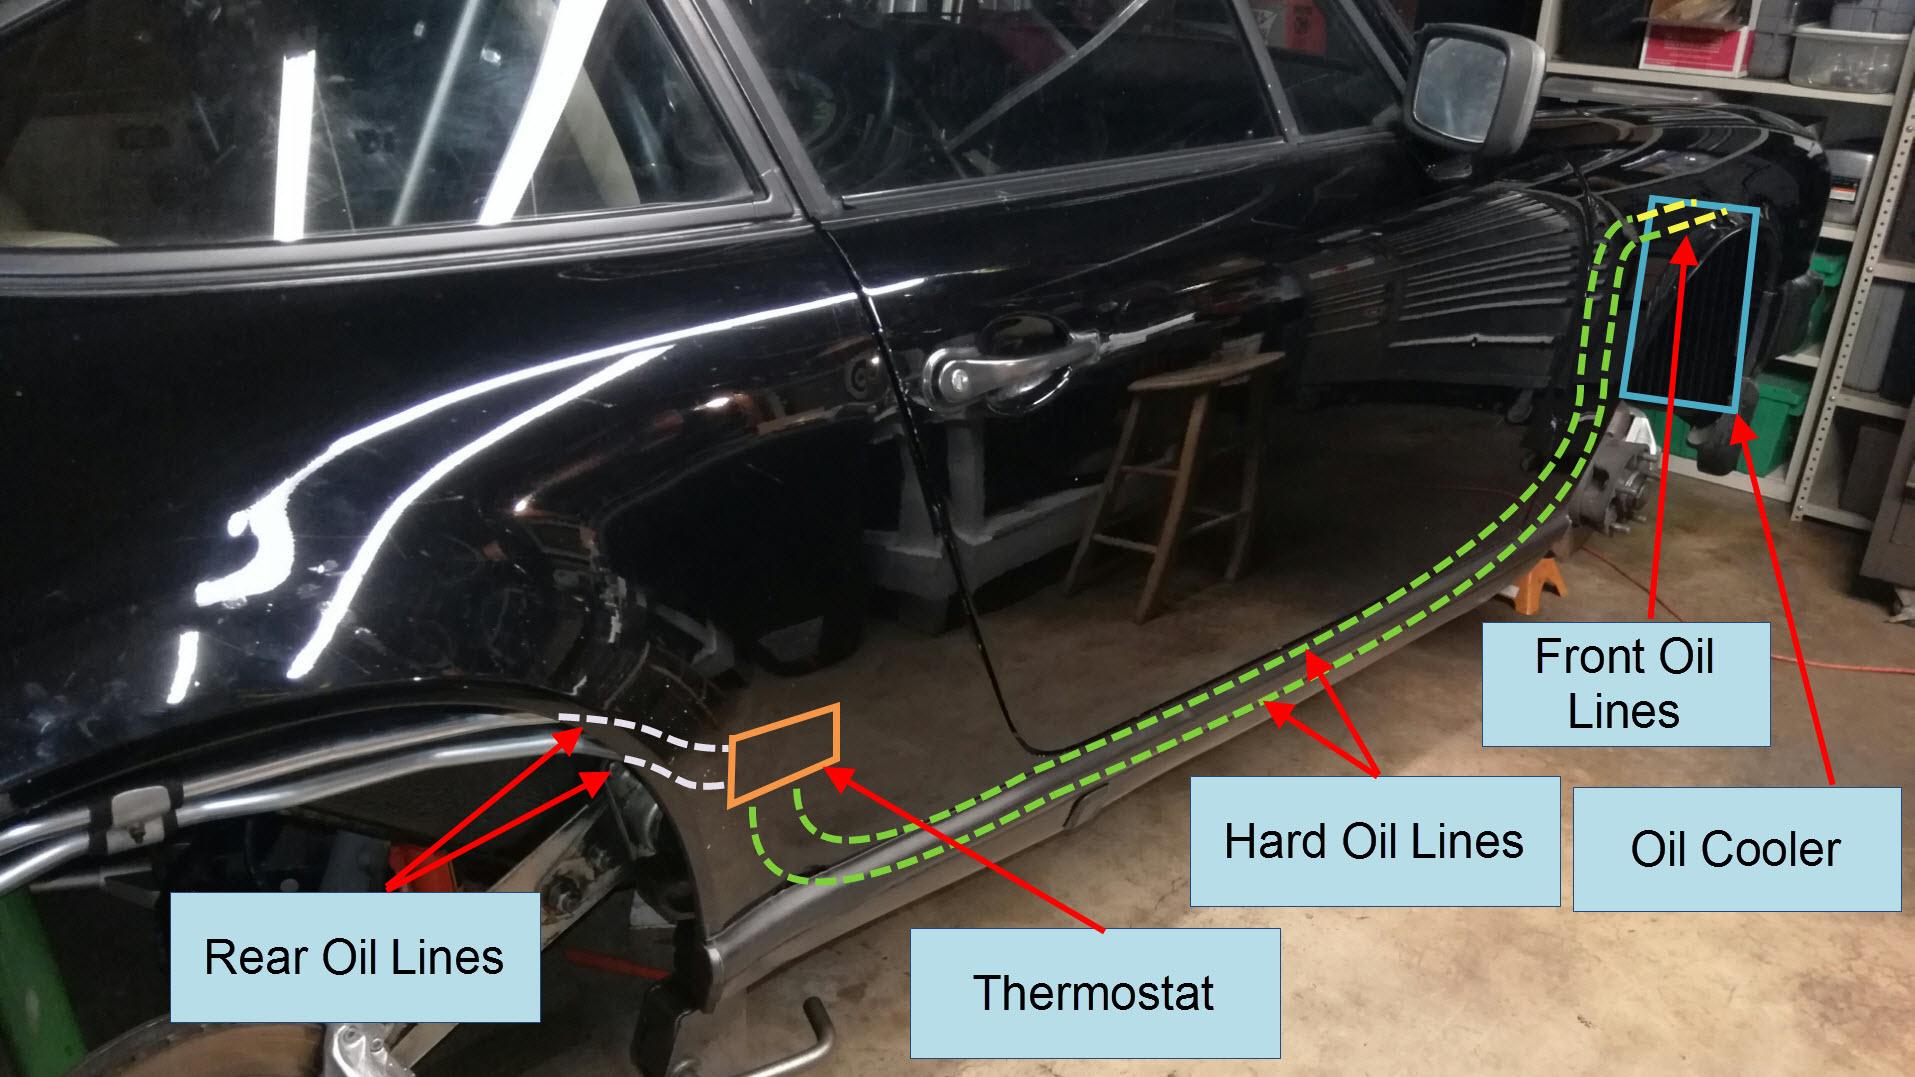 Air-cooled Porsche 911 oil cooler lines schematic